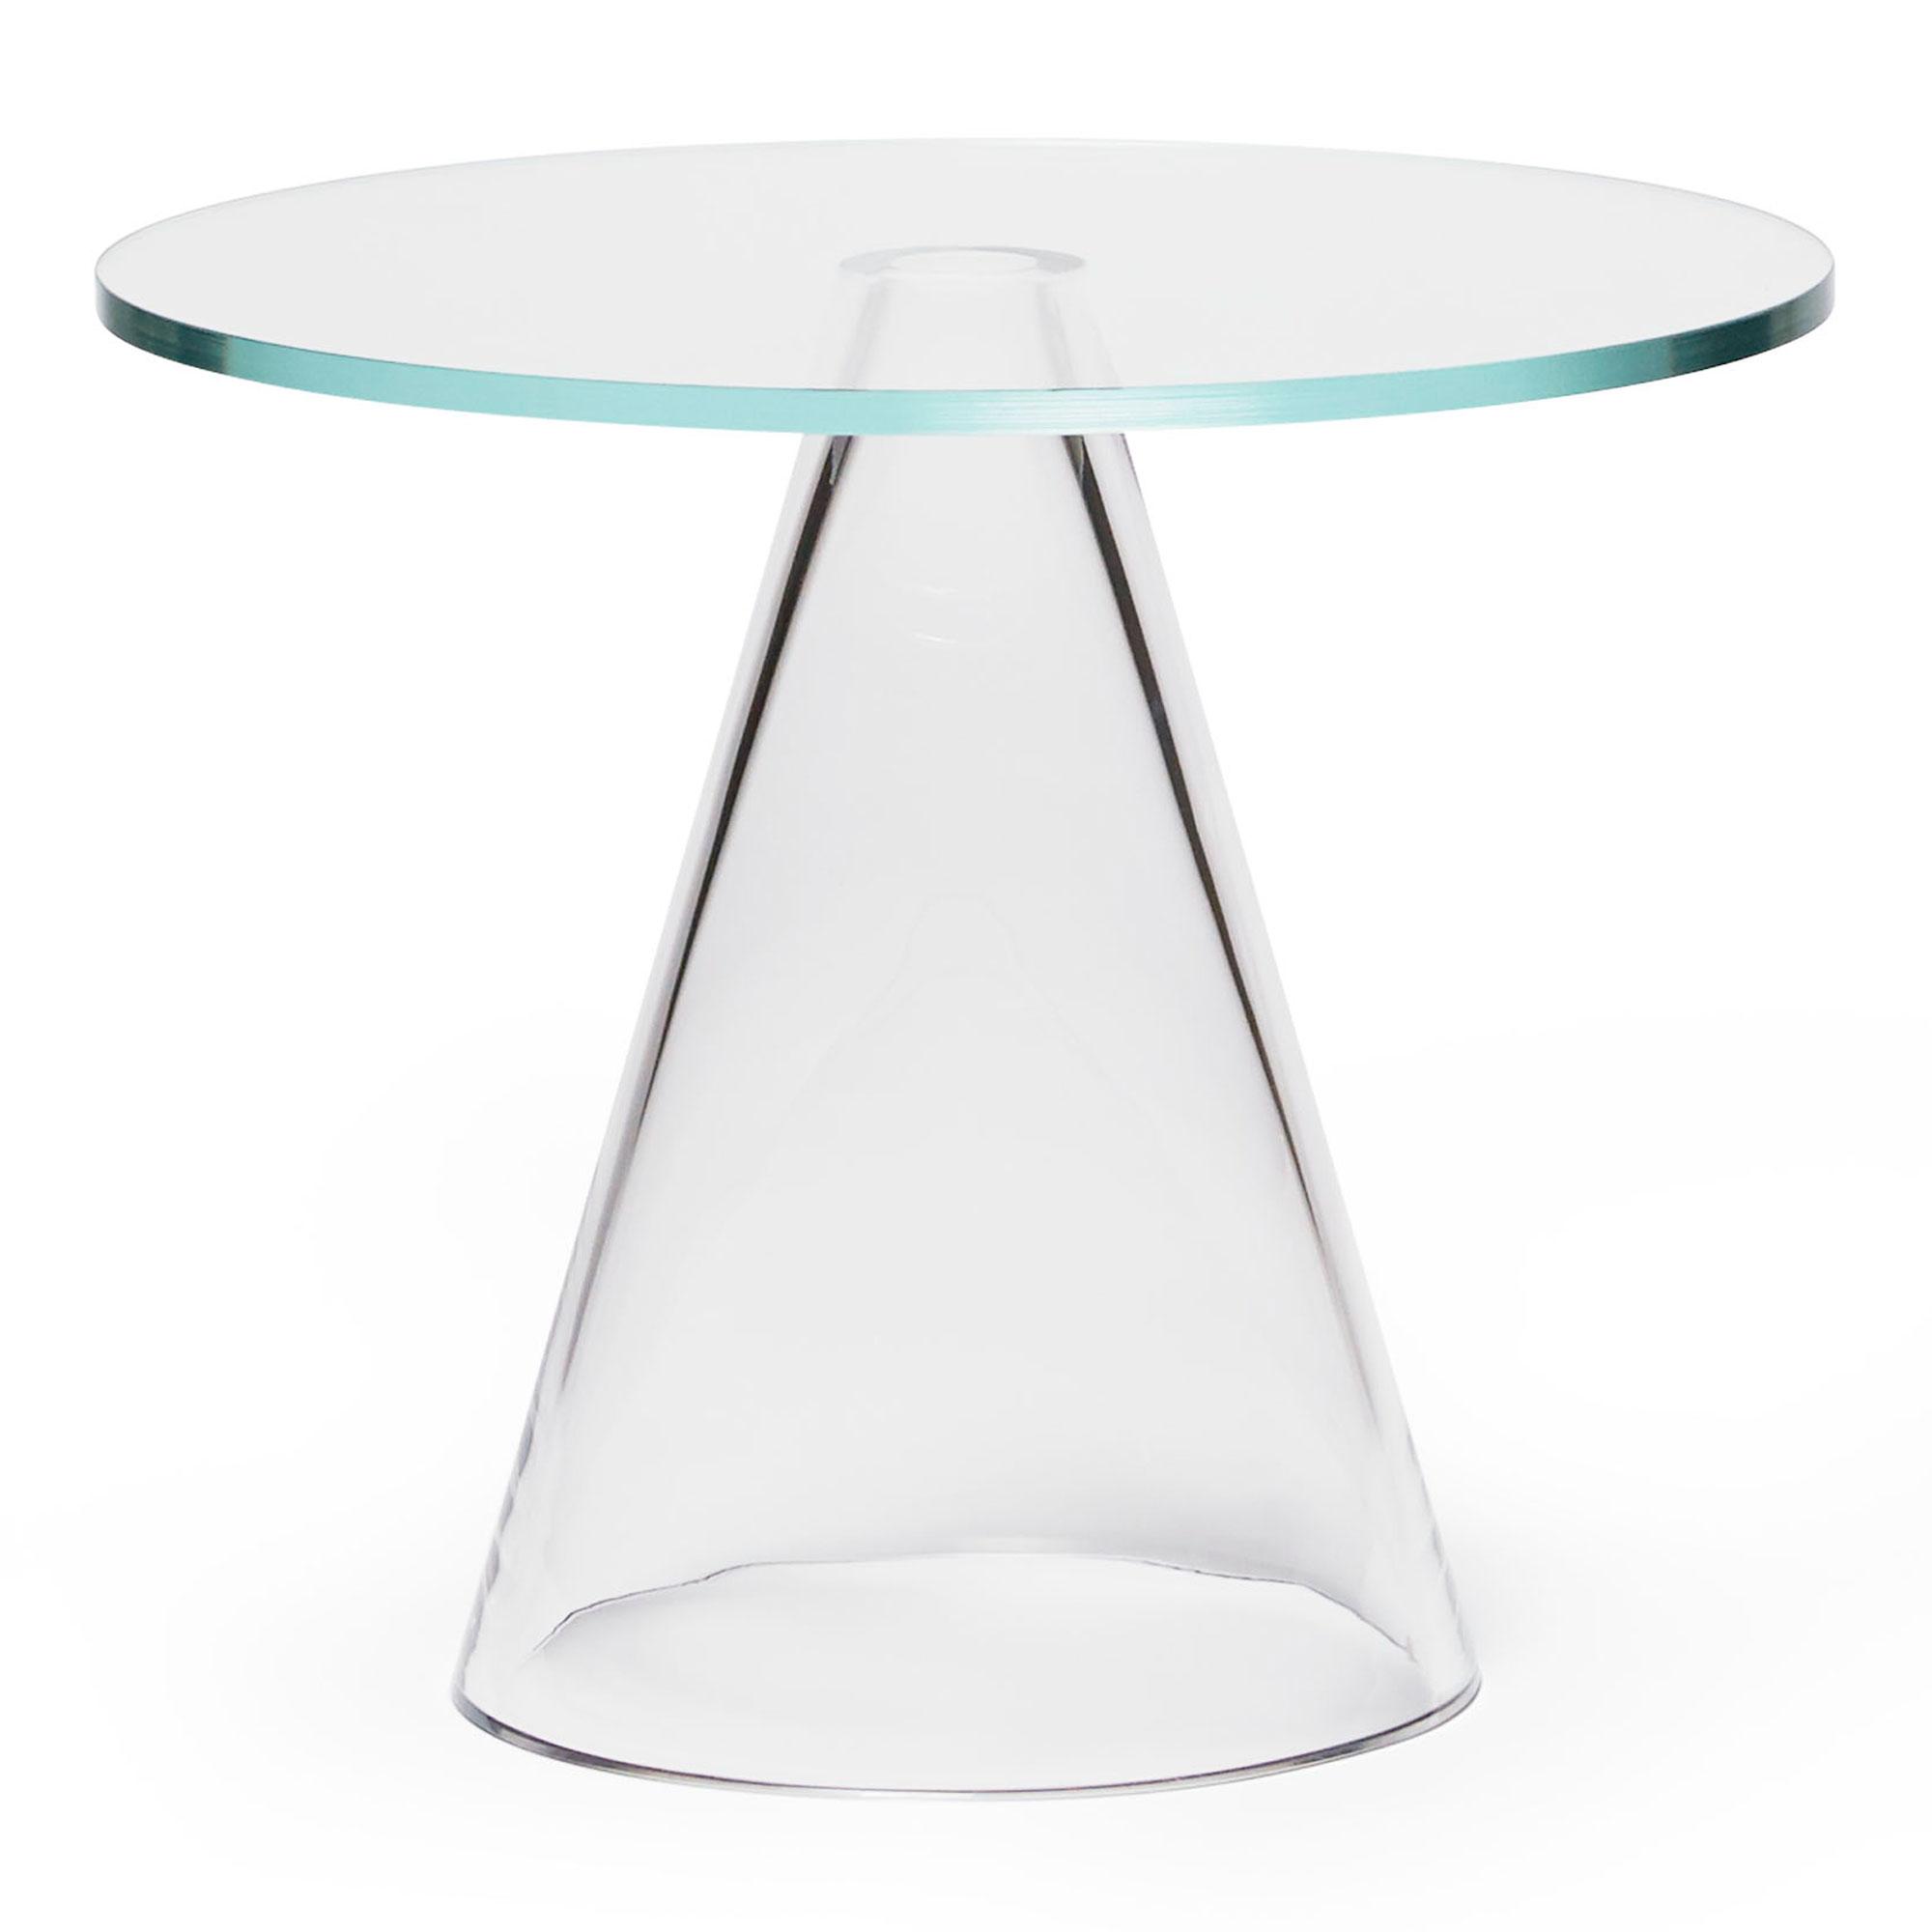 MASSPRODUCTION- Sander Table